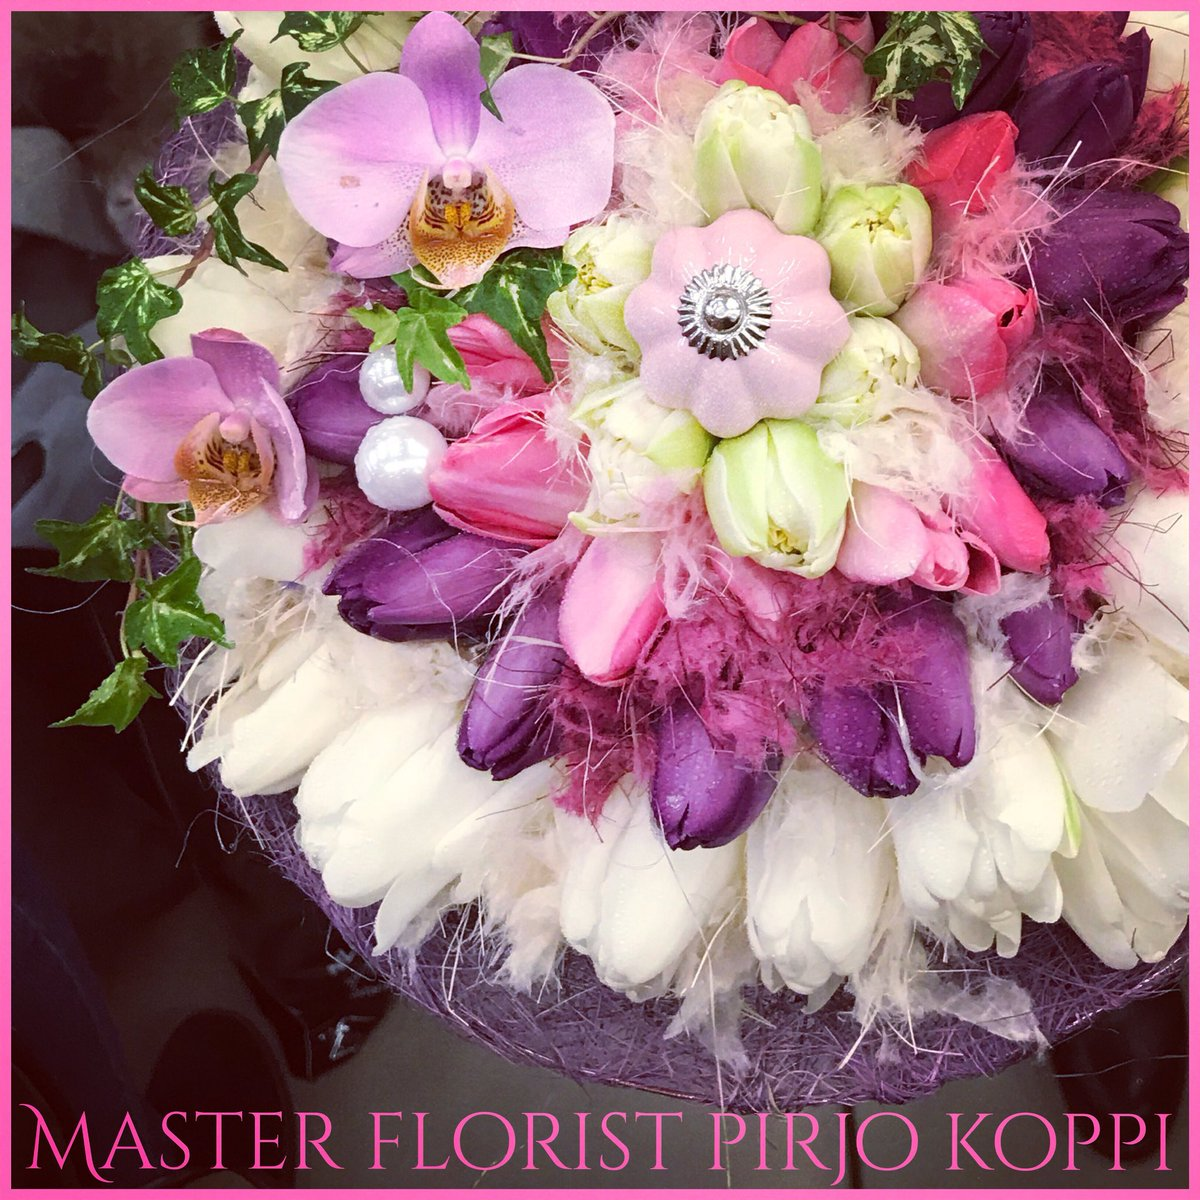 Pirjo Koppi On Twitter Have A Nice Flower Weekend Tulip Tulips